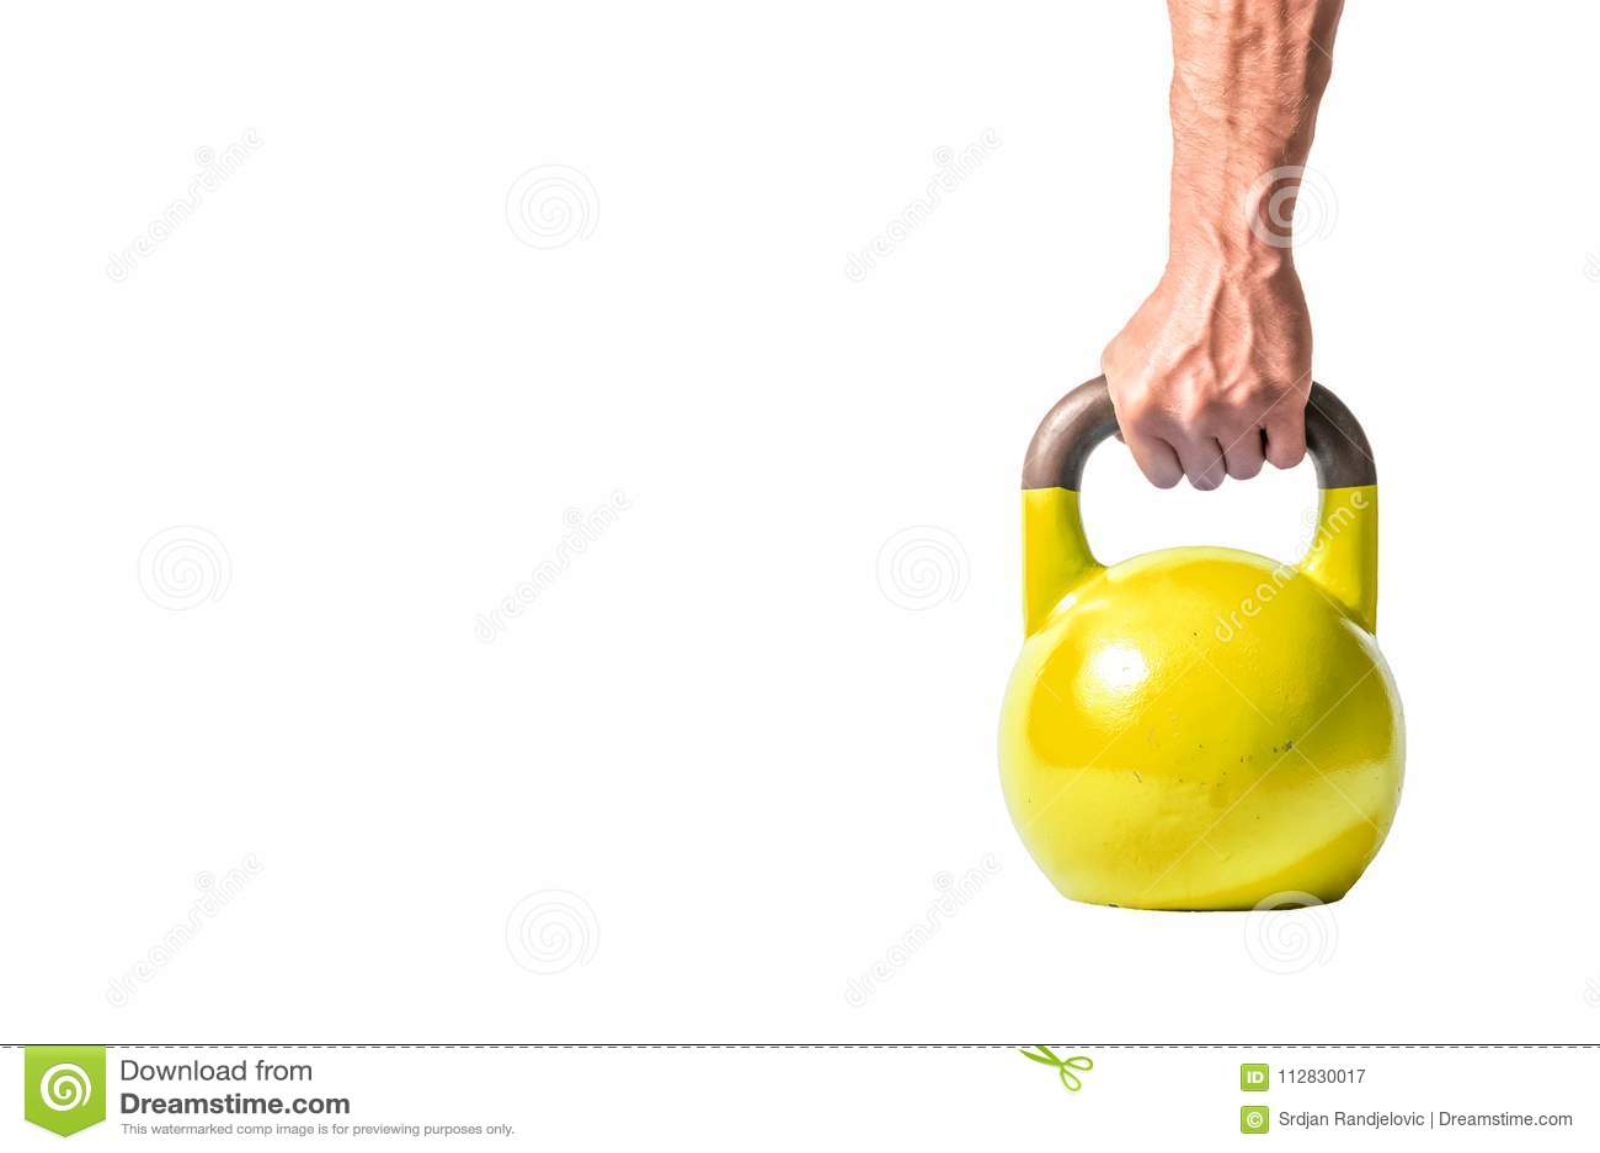 Sterke spiermensenhand met spieren die gele zware die kettlebell houden gedeeltelijk op witte achtergrond wordt geïsoleerd